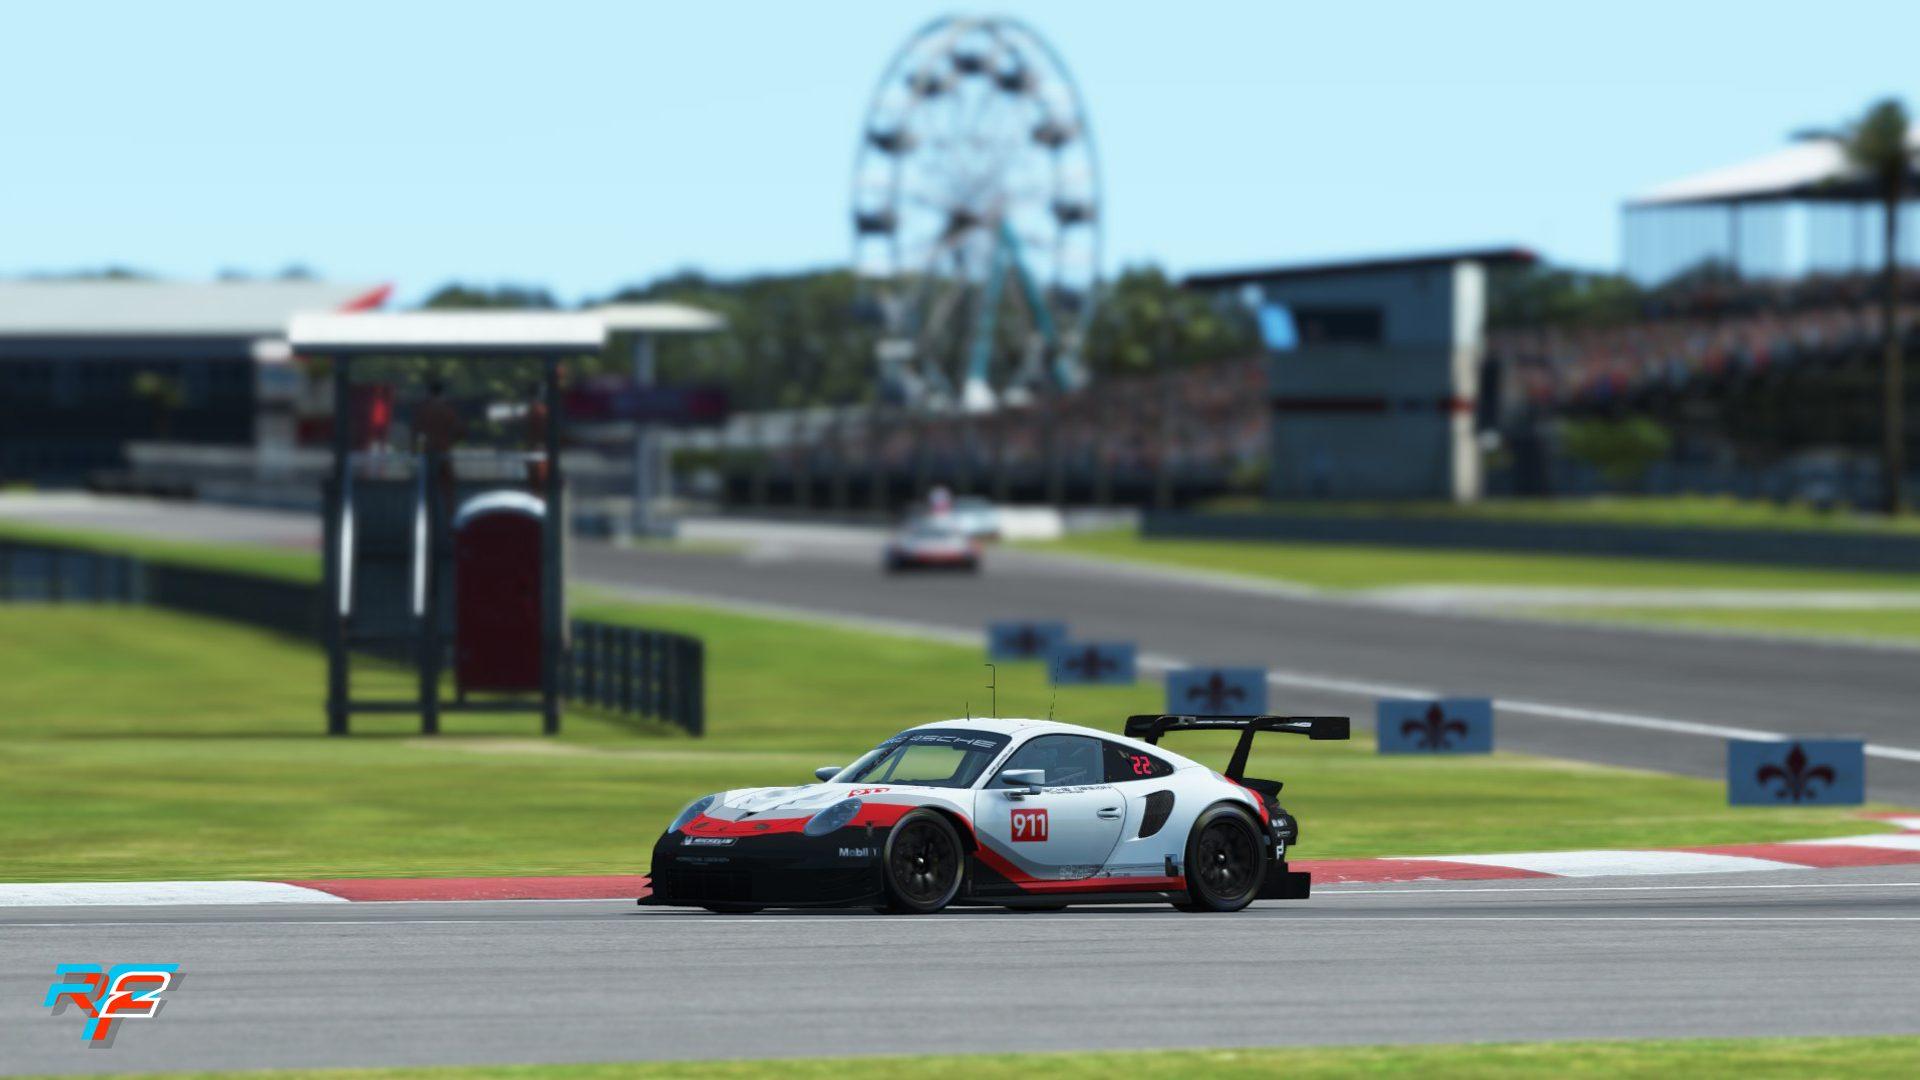 Porsche-911-RSR-3-1920x1080